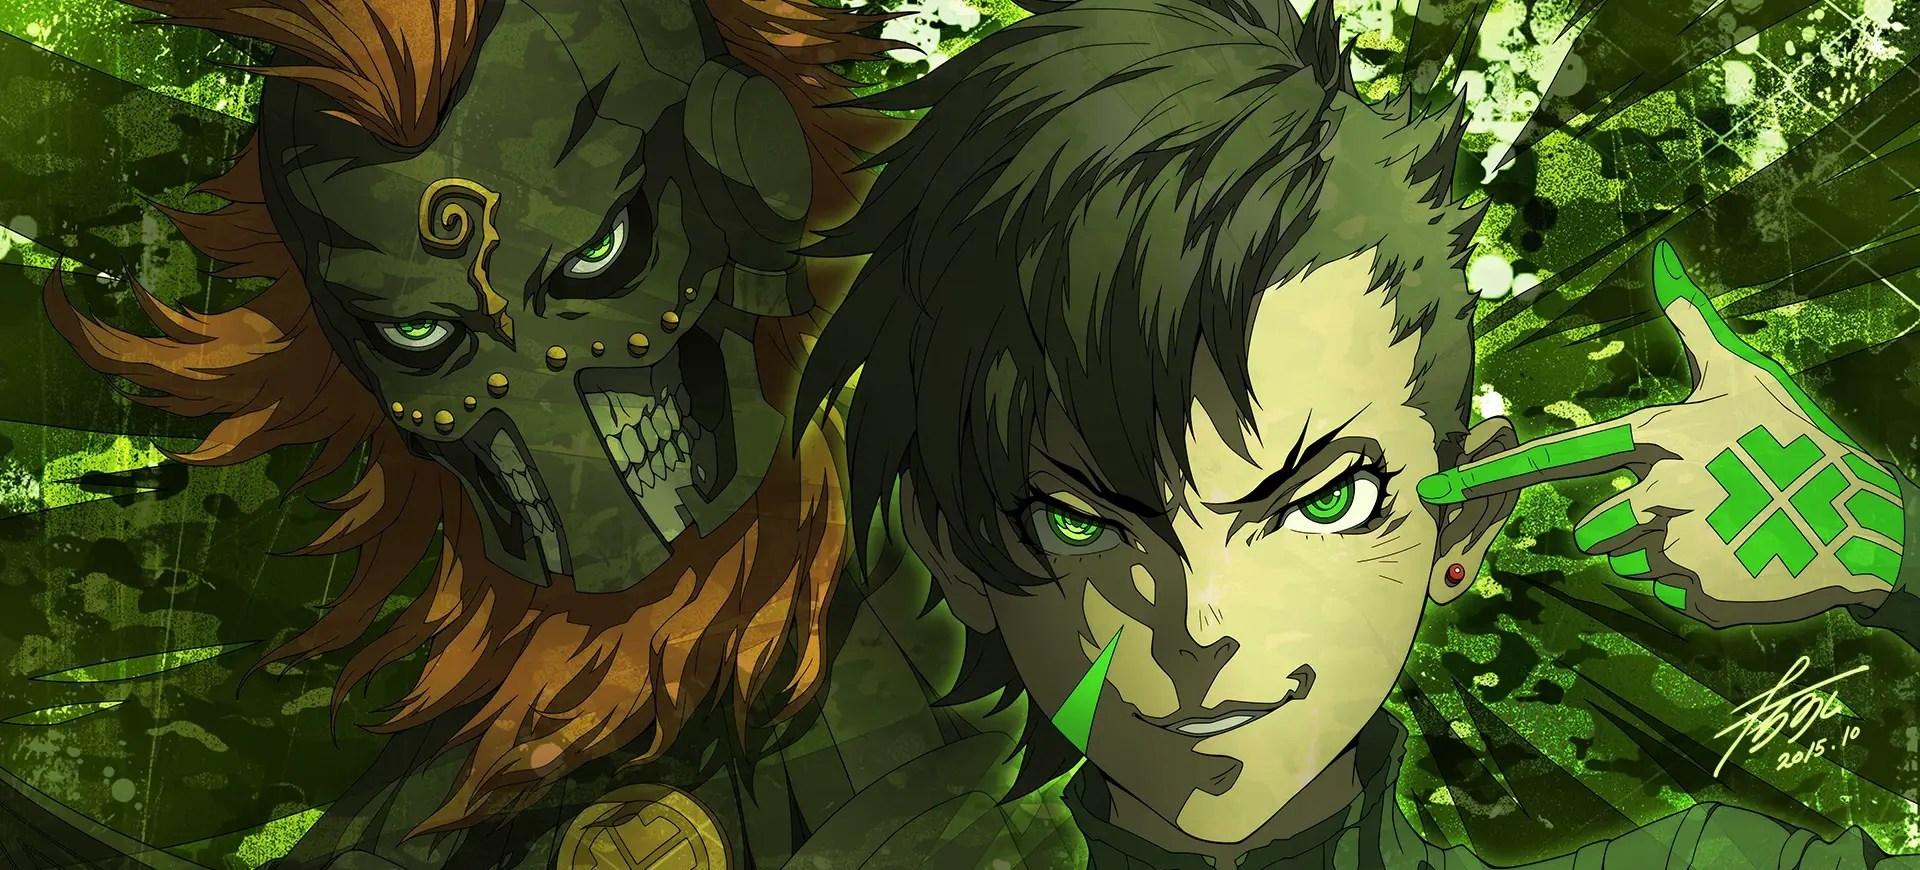 7th Dragon III Code VFD And Shin Megami Tensei IV